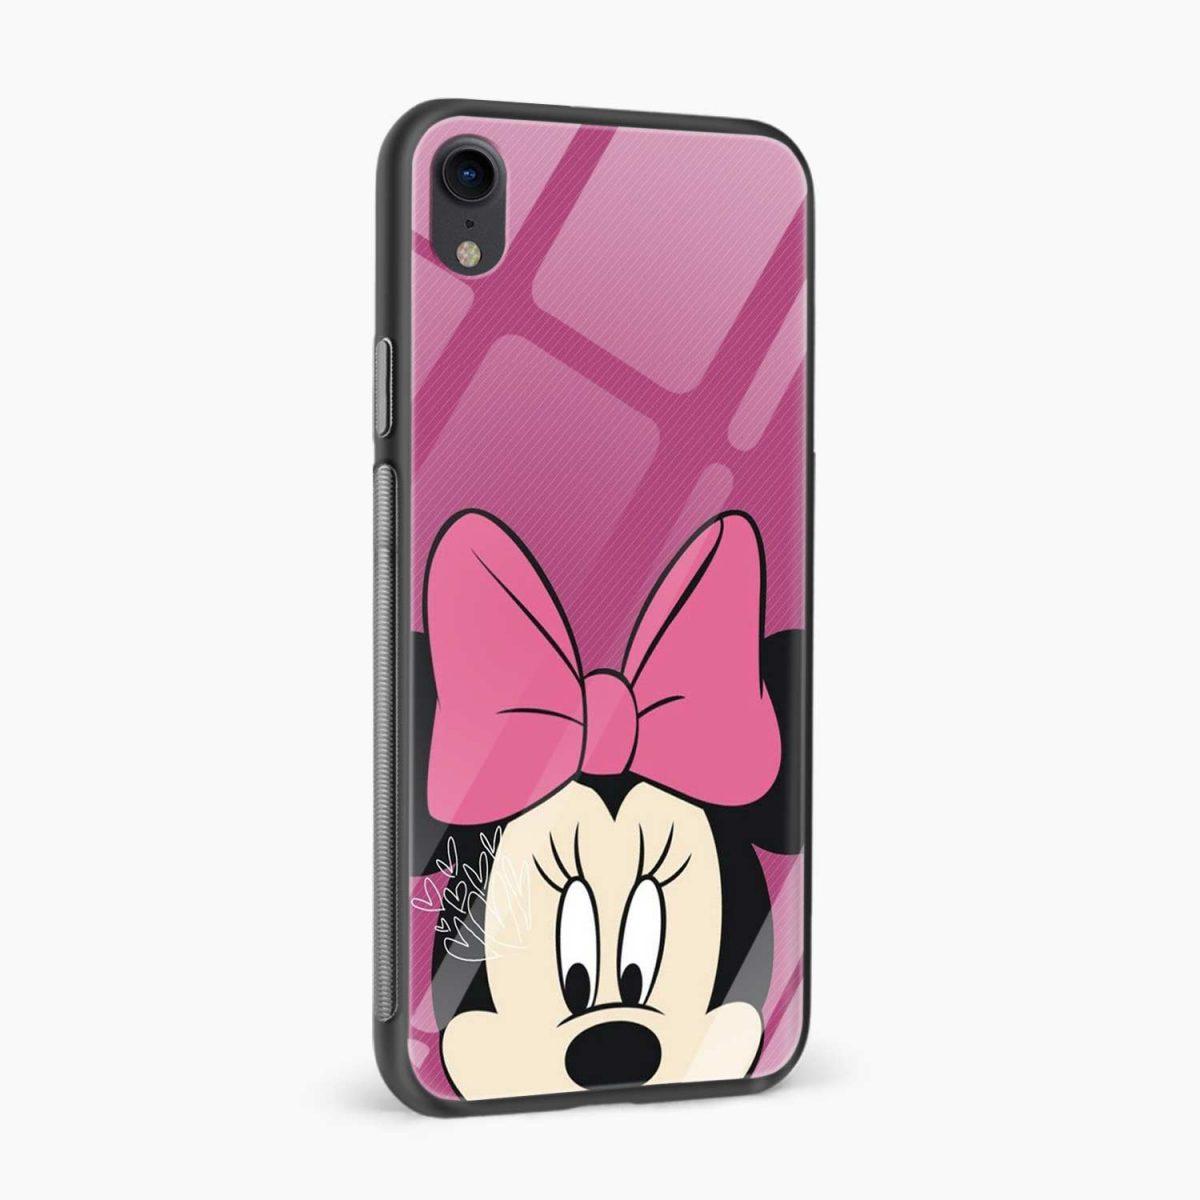 disney minnie cartoon apple iphone xr back cover side view